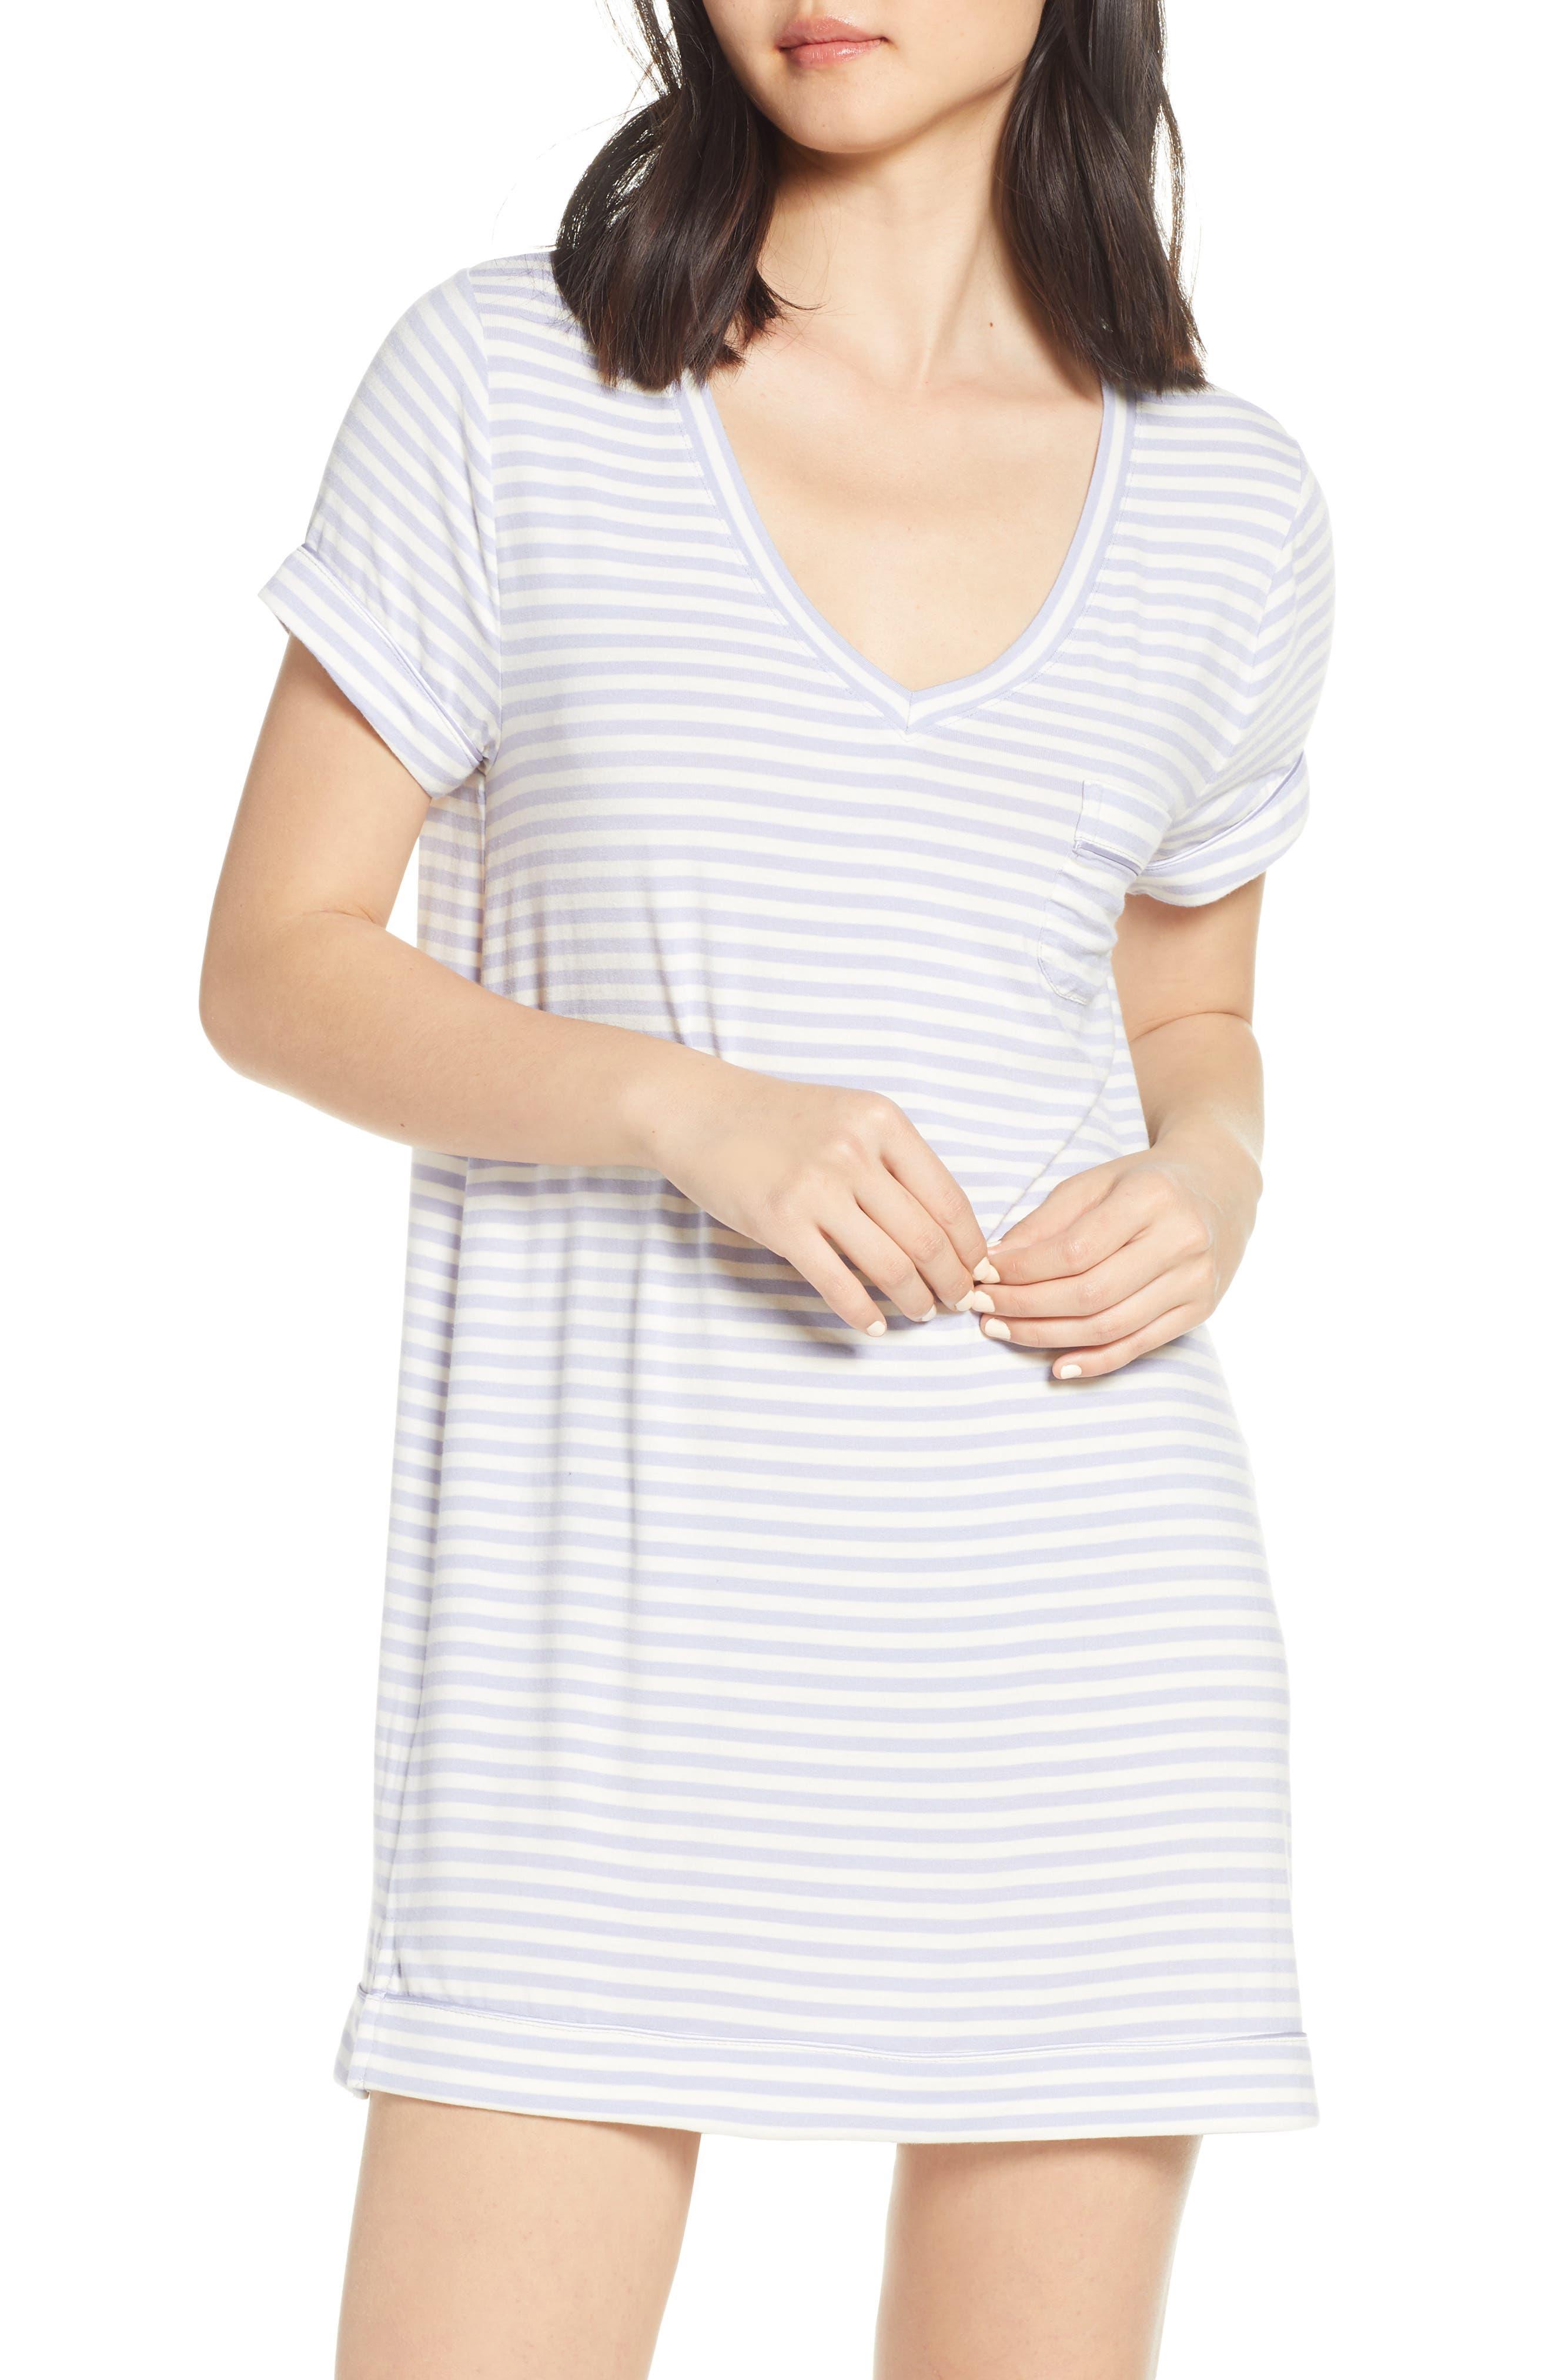 NORDSTROM LINGERIE Moonlight Sleep Shirt, Main, color, PURPLE COSMIC EVEN STRIPE